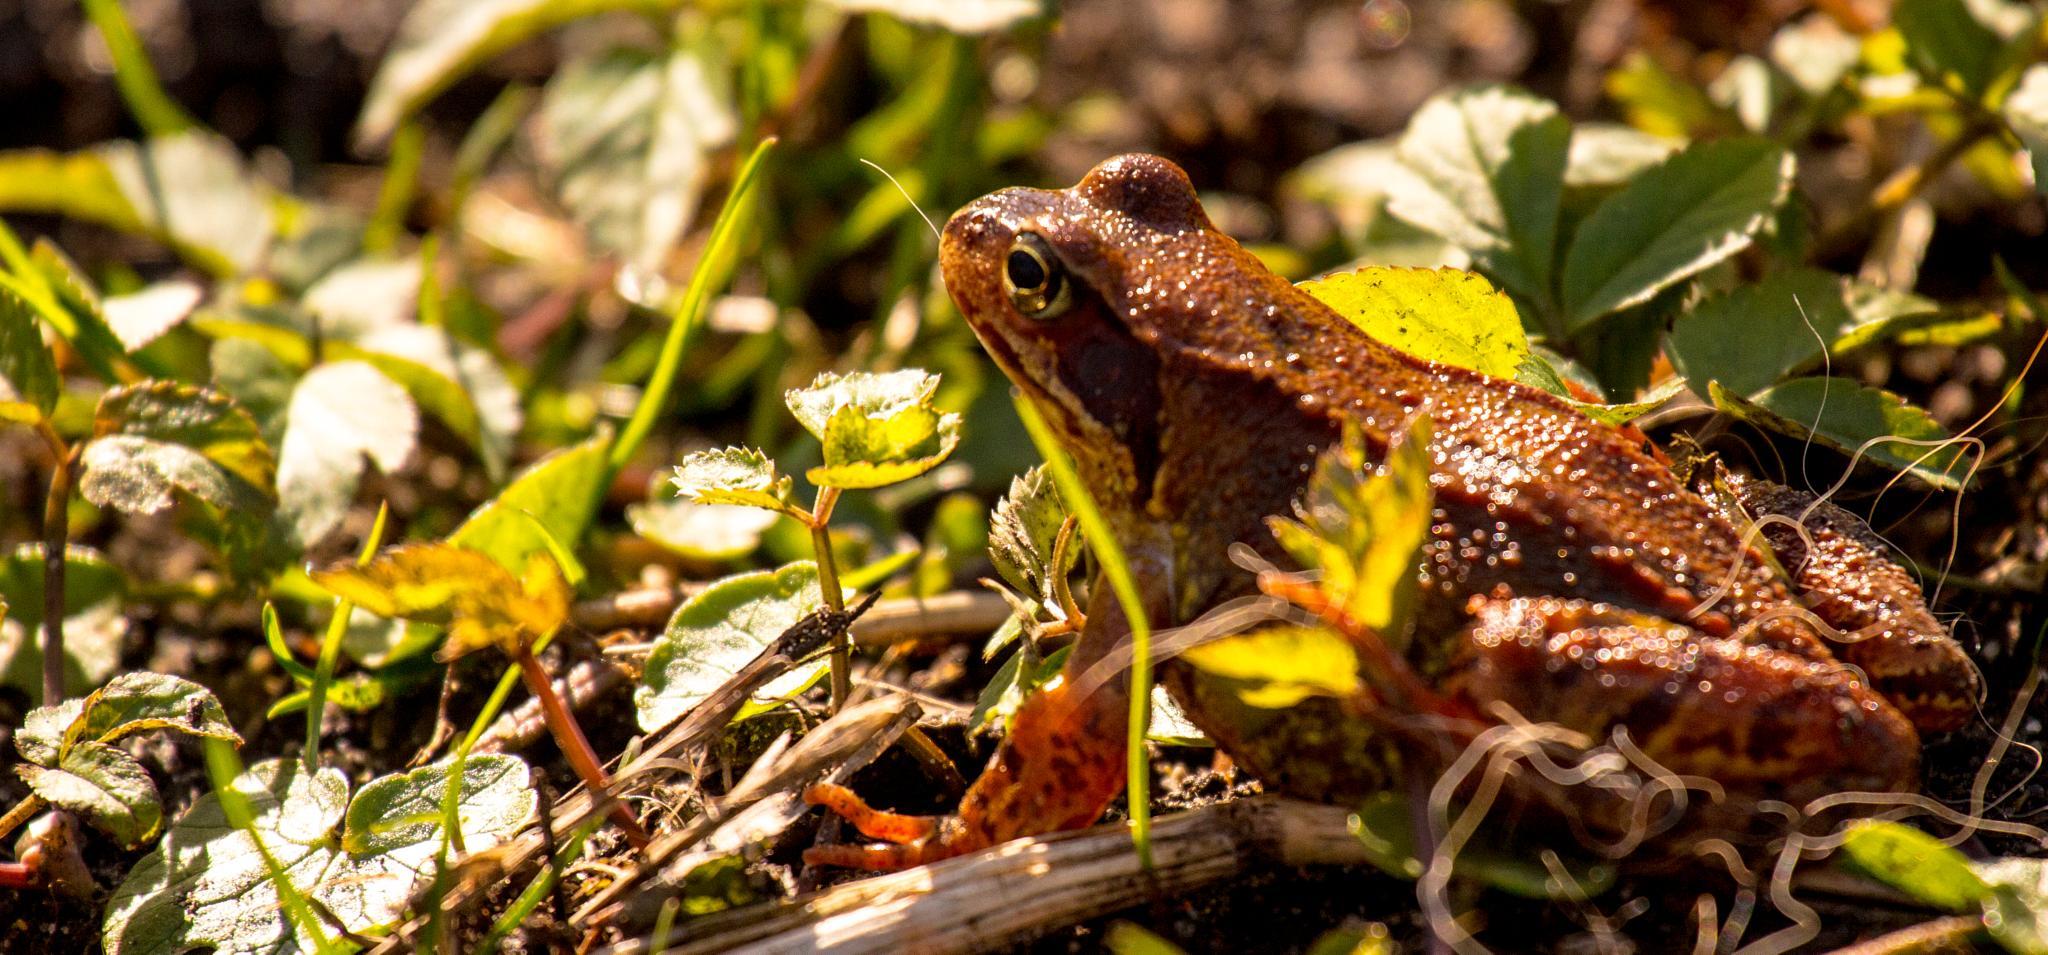 frog by knud erik simonsen